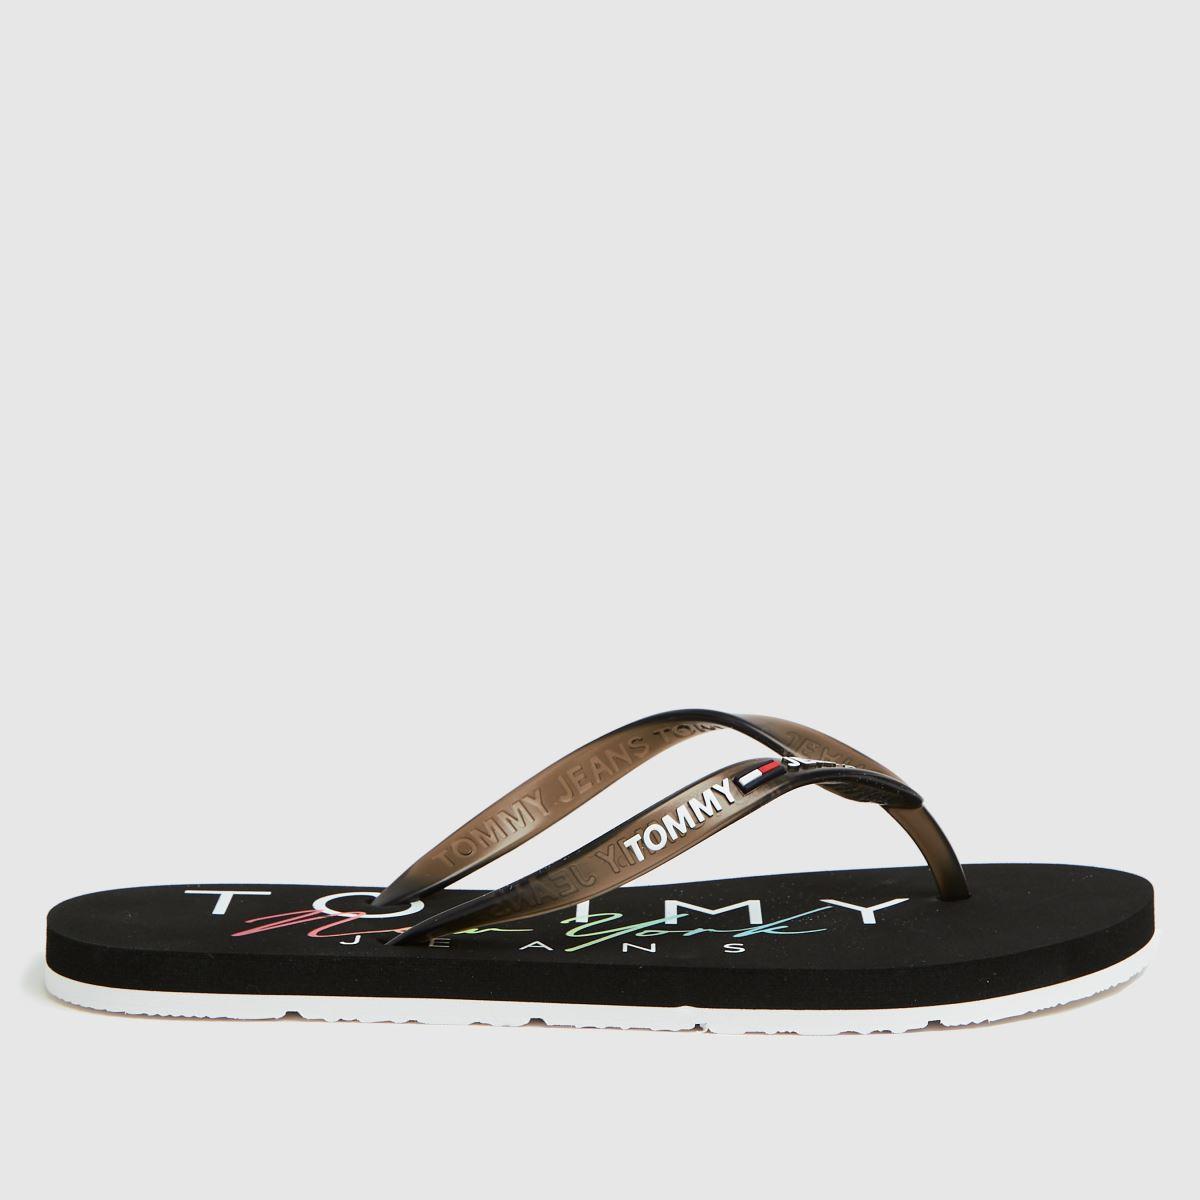 Tommy Hilfiger Black Rubber Thong Beach Sandals